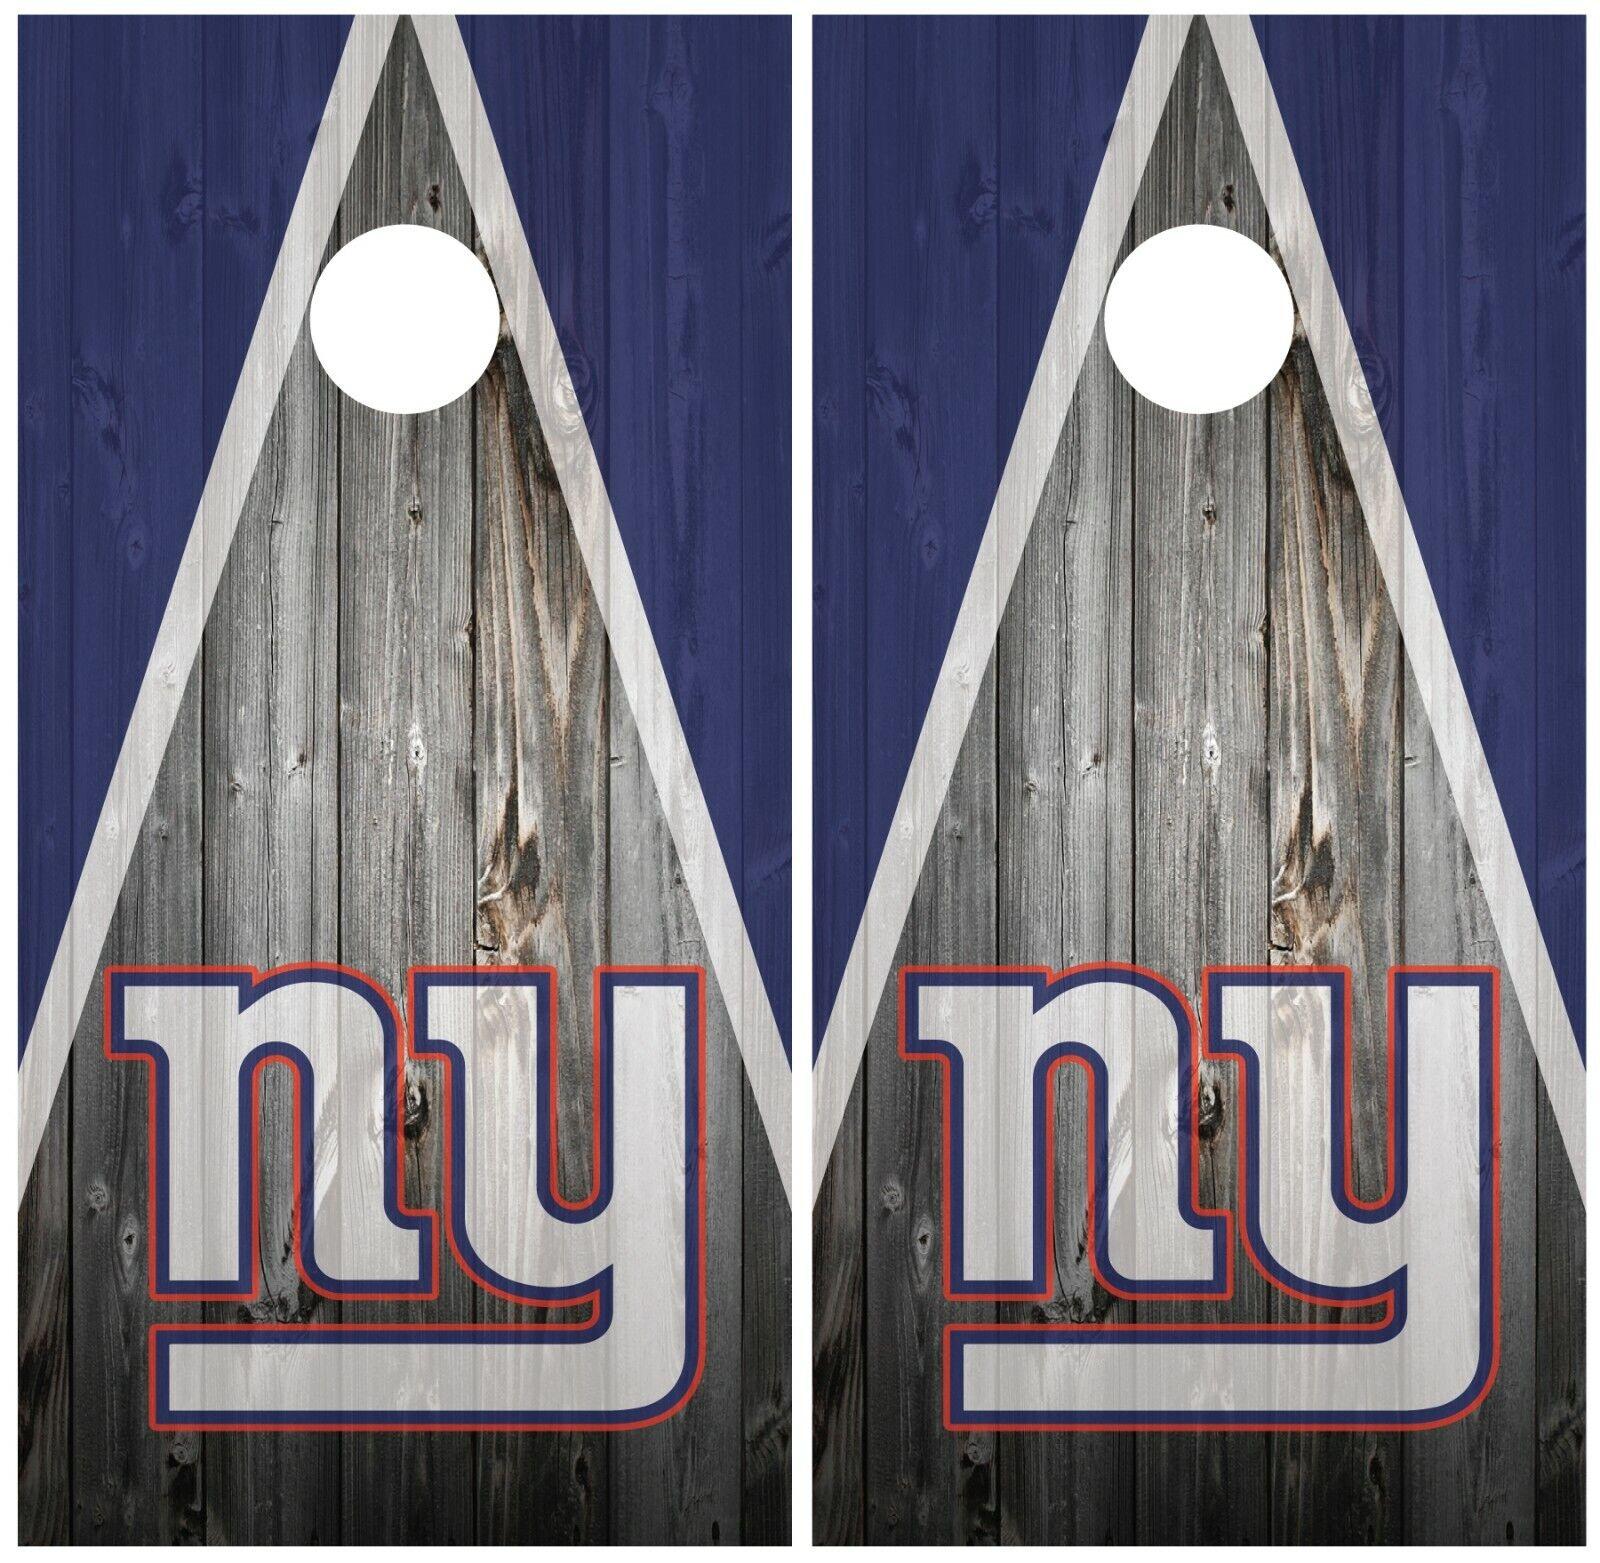 New  York Giants Wood Cornhole Board Wraps Skins Vinyl Laminated HIGH QUALITY   honest service